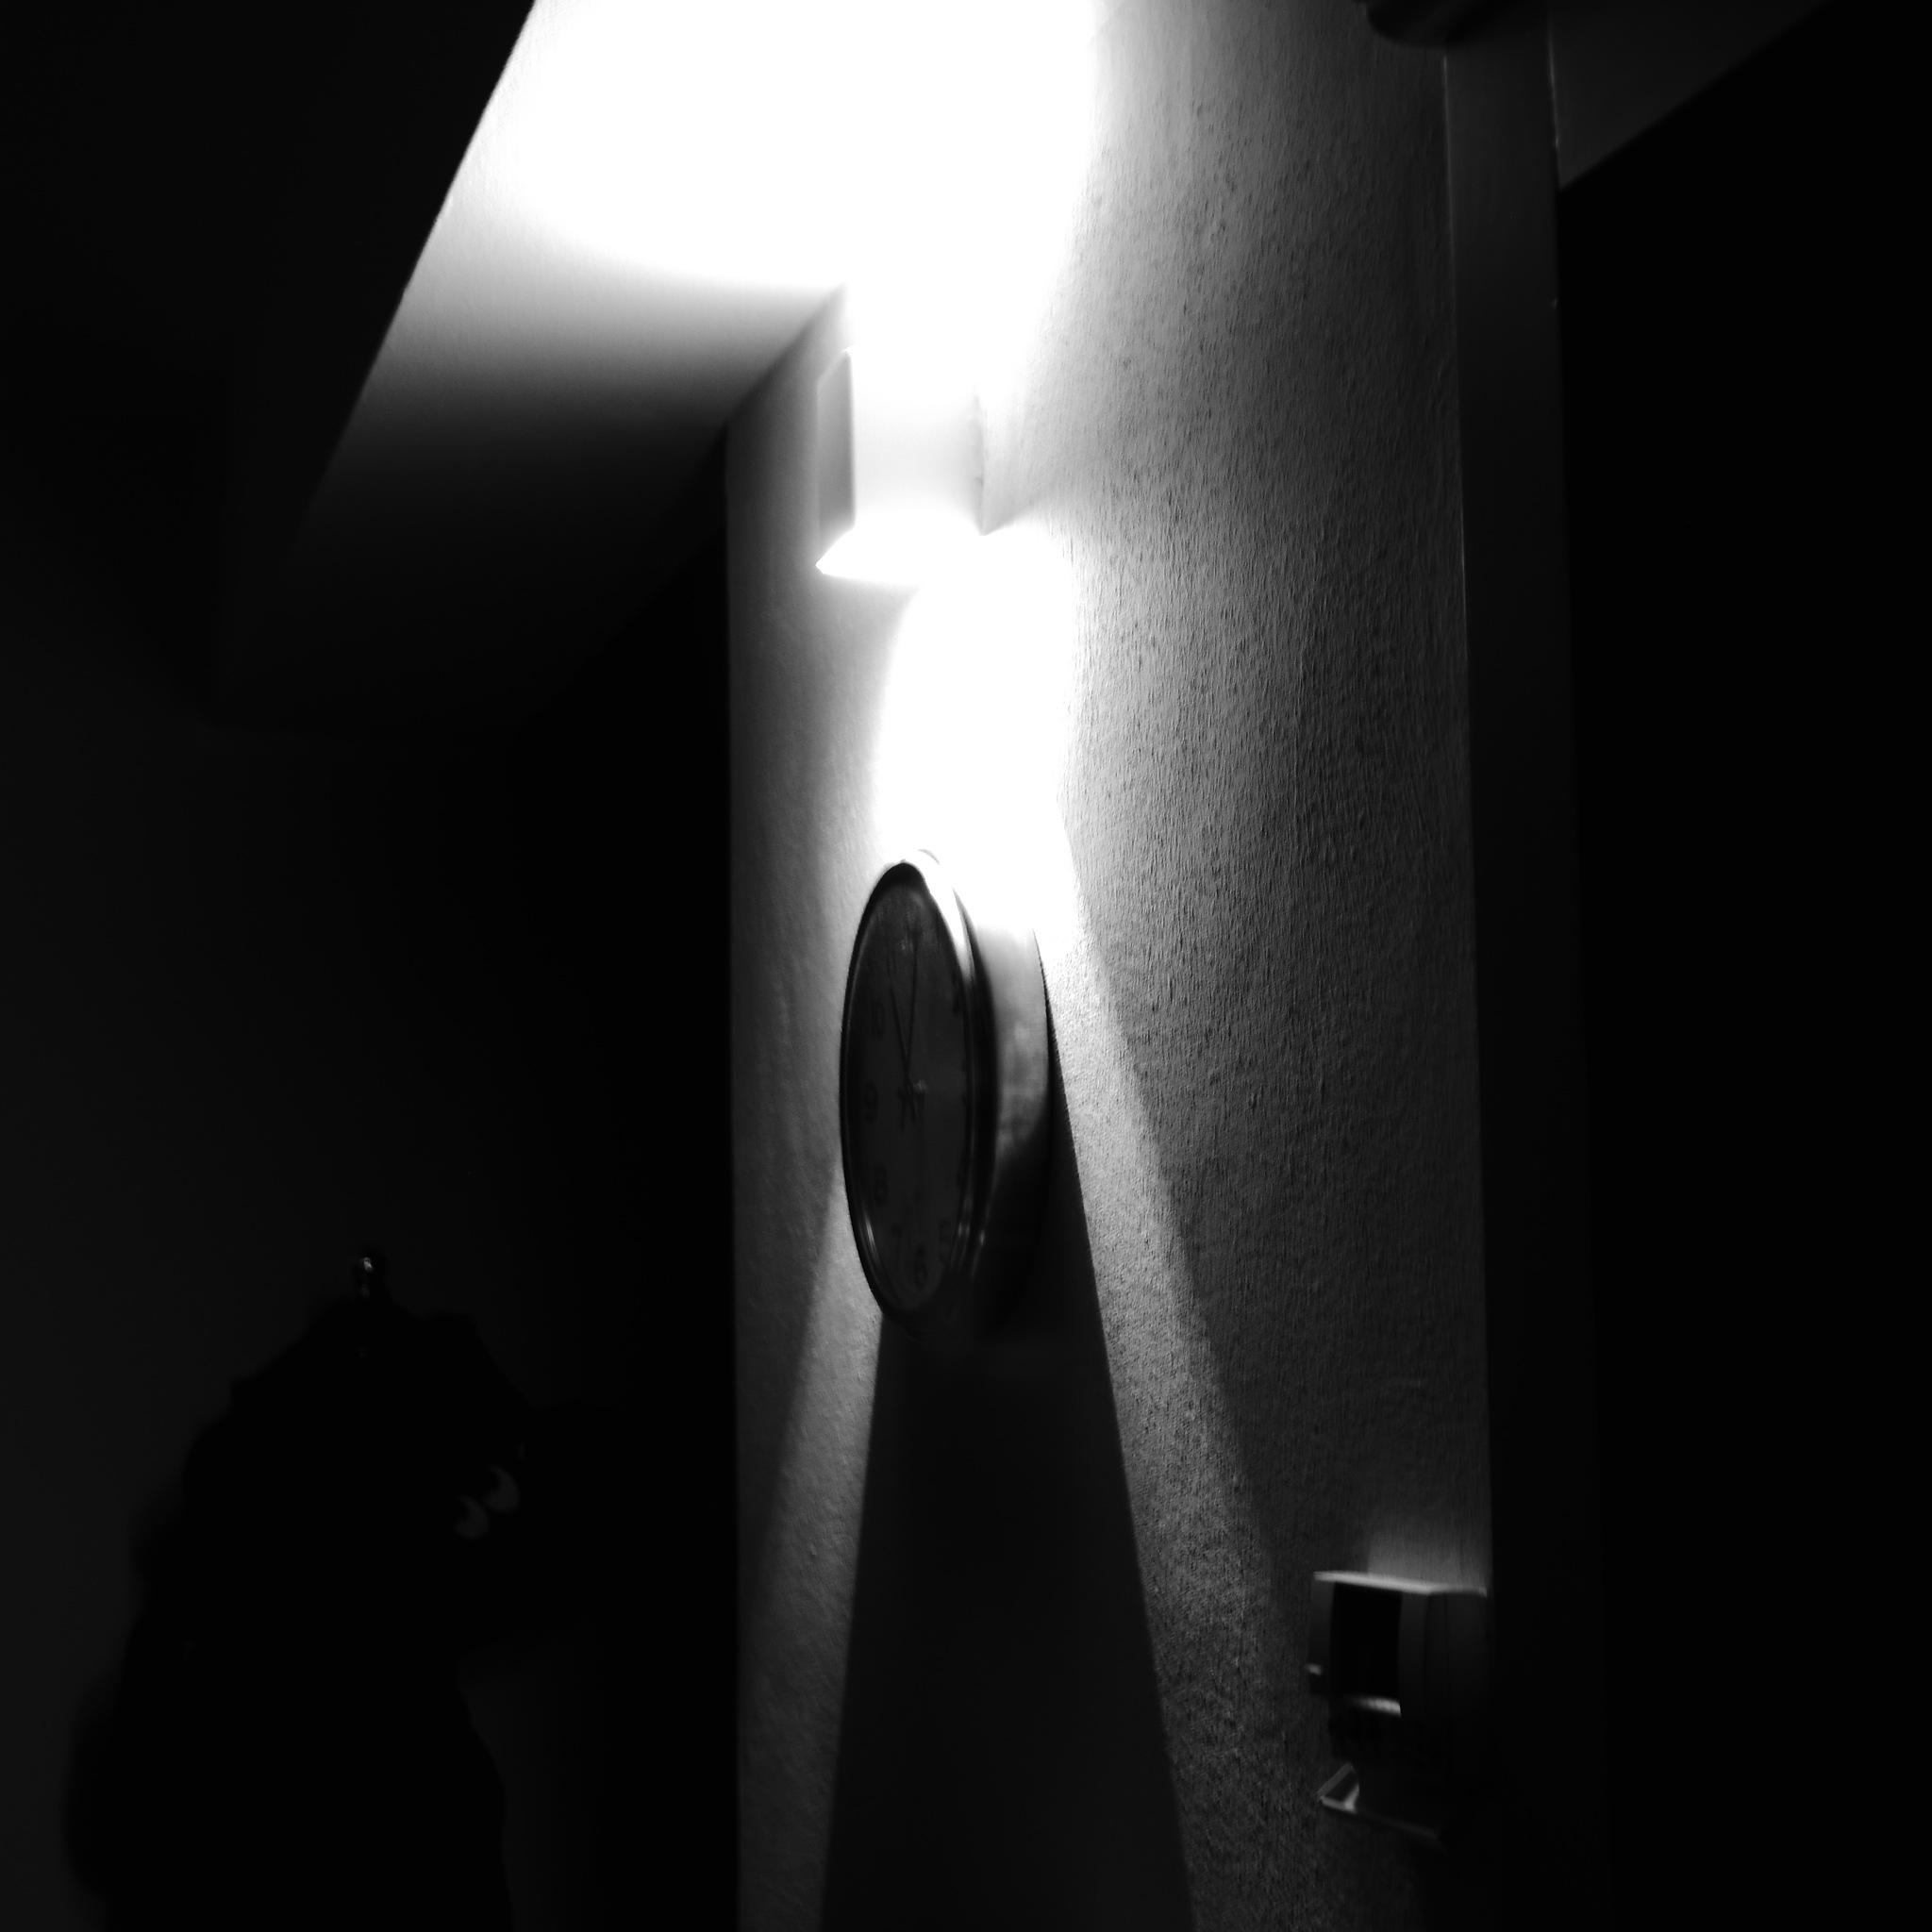 Night Time by Mau056